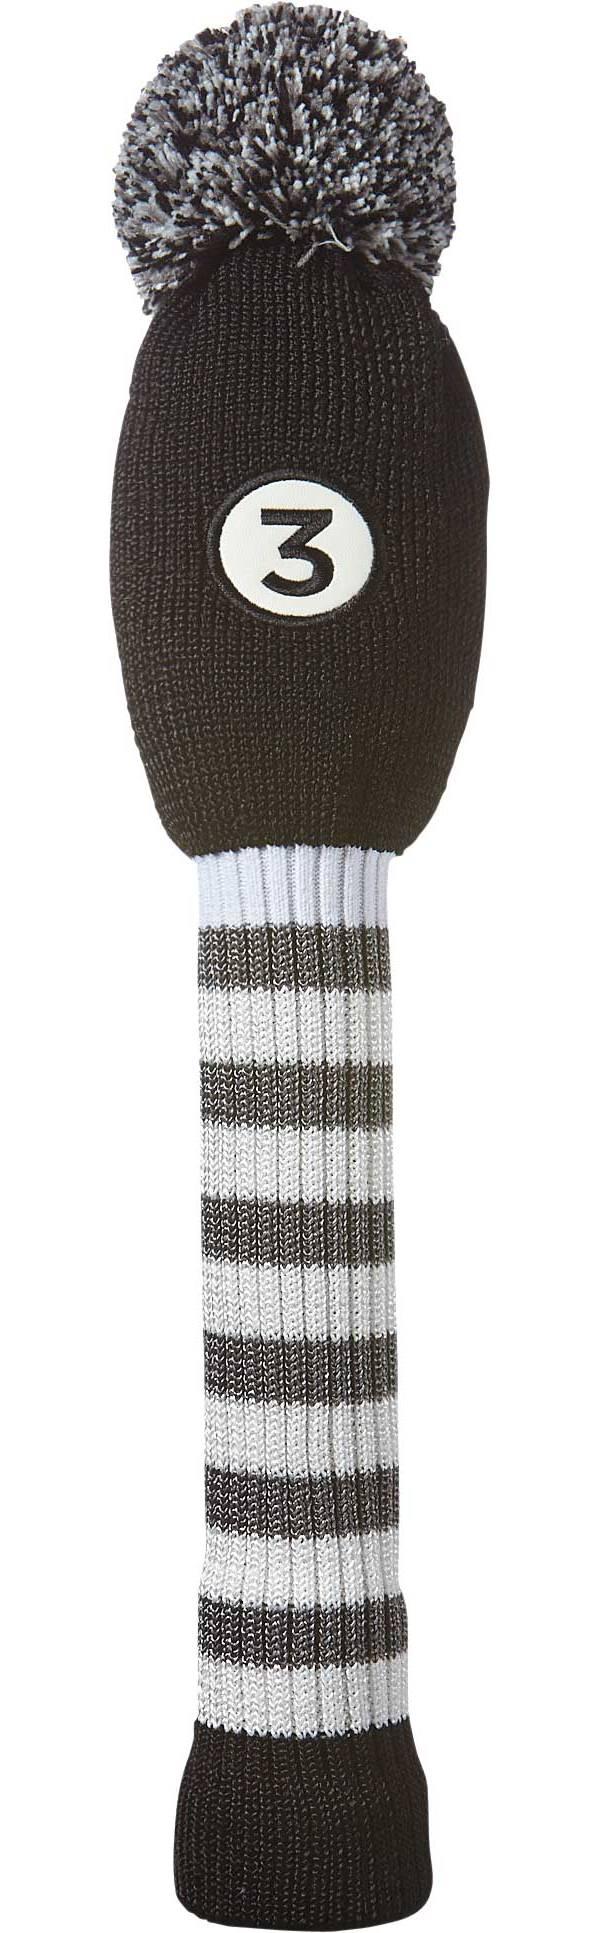 Maxfli Vintage Knit Fairway Wood Headcover product image